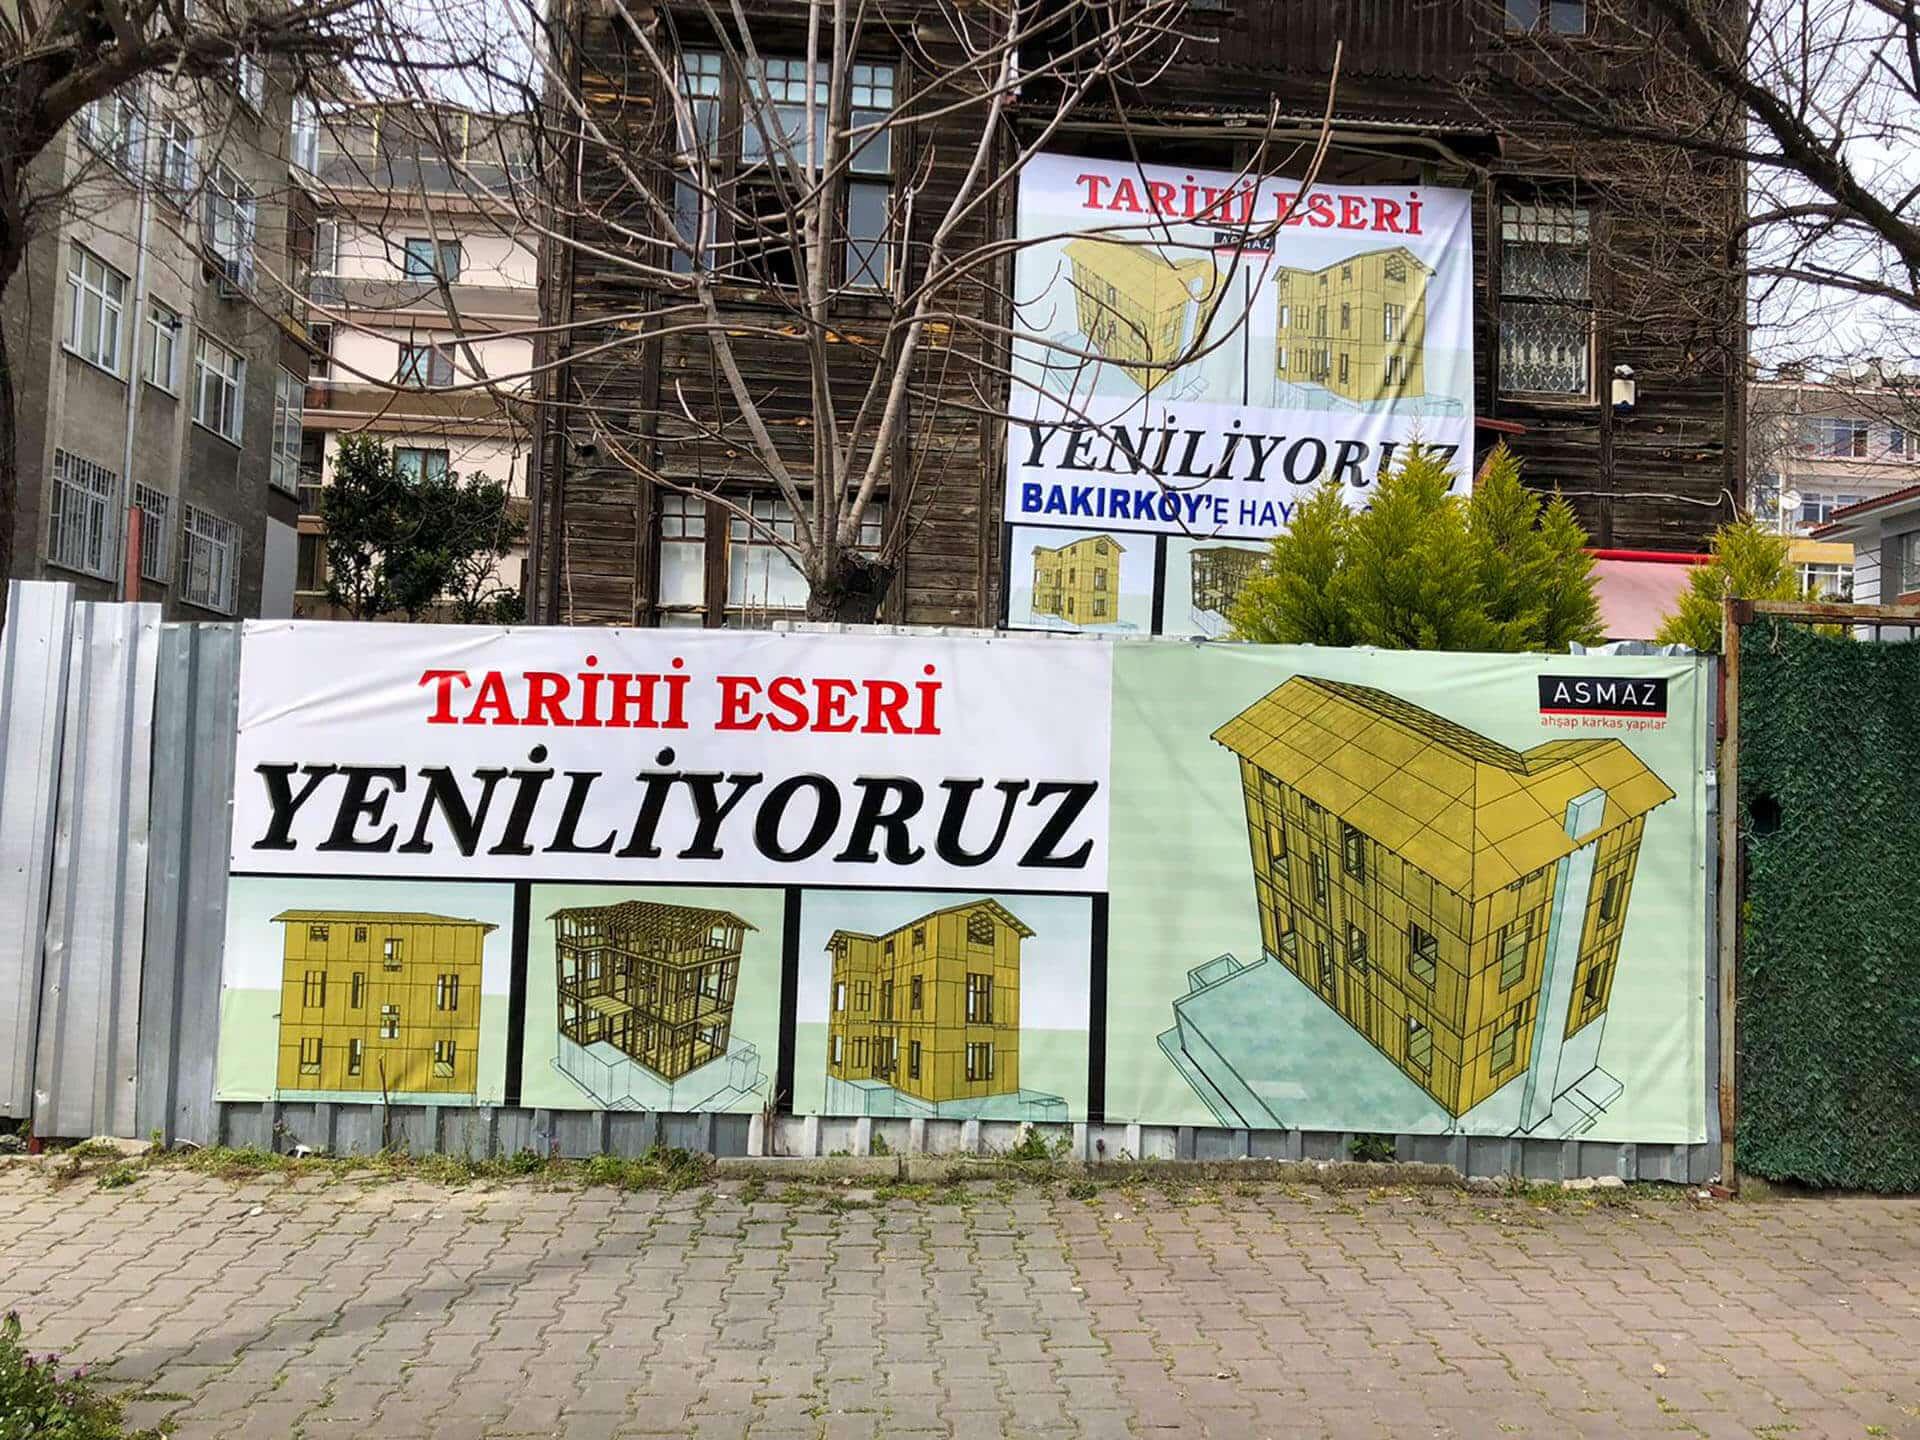 Bakırköy Tarihi Eser Restorasyon